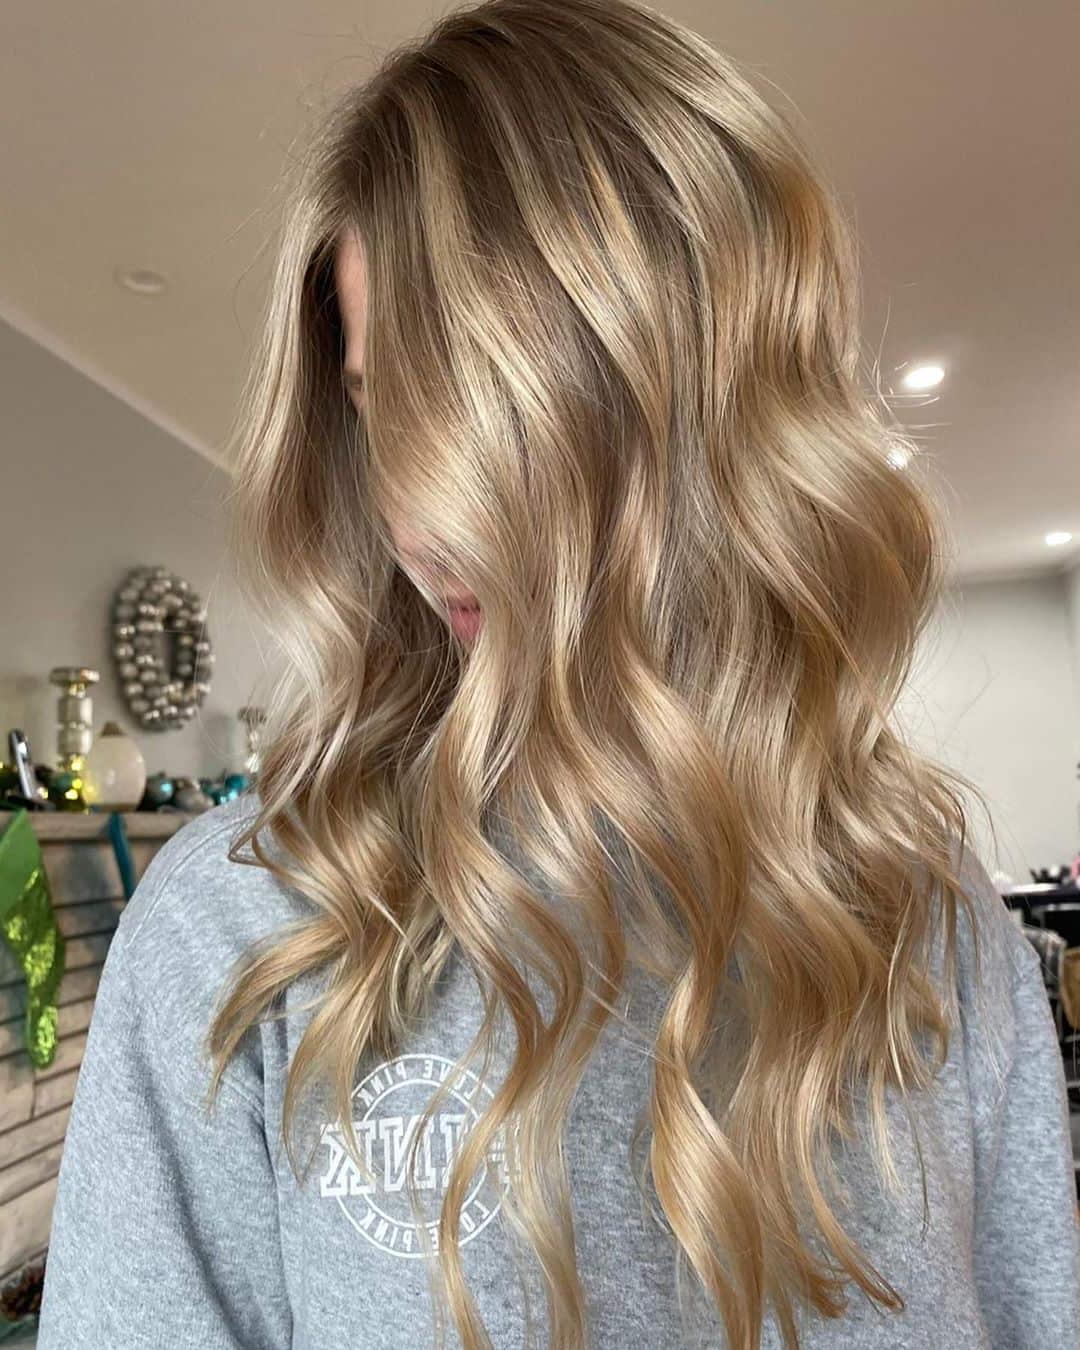 21 Beautiful Blonde Balayage Hairstyles | Stylesrant With Warm Blonde Balayage Hairstyles (View 4 of 20)